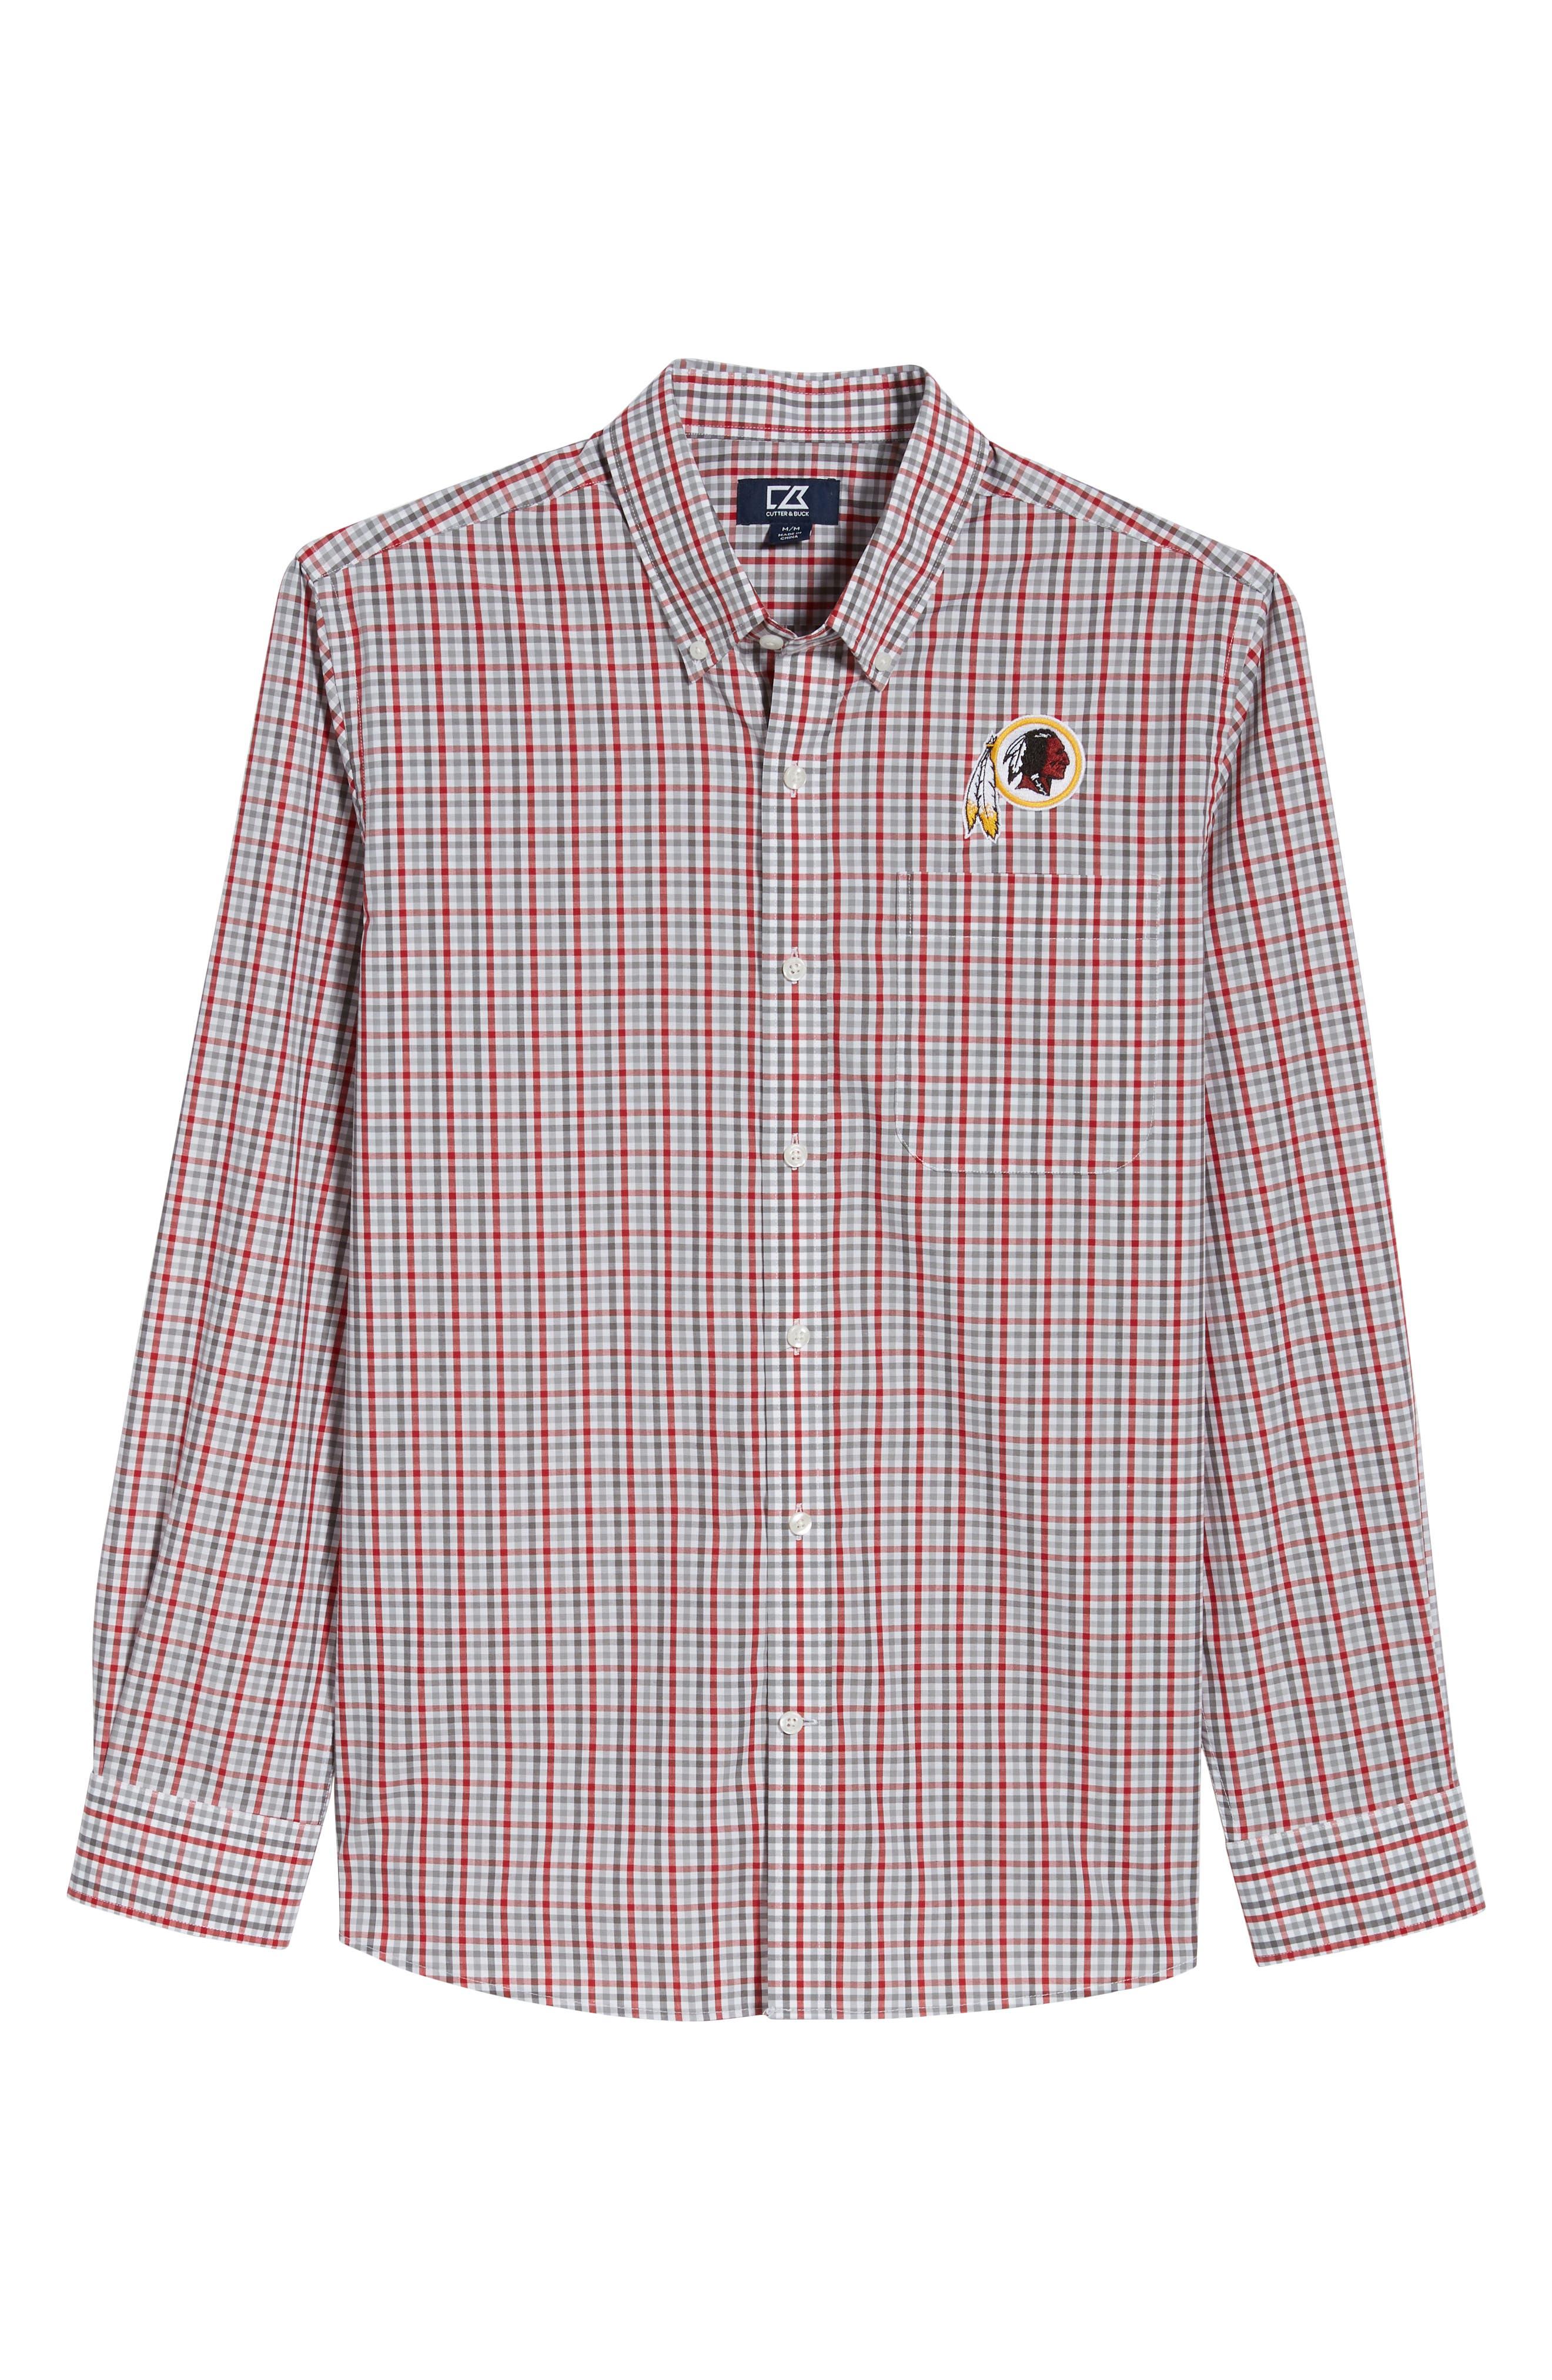 Washington - Gilman Regular Fit Plaid Sport Shirt,                             Alternate thumbnail 6, color,                             CARDINAL RED